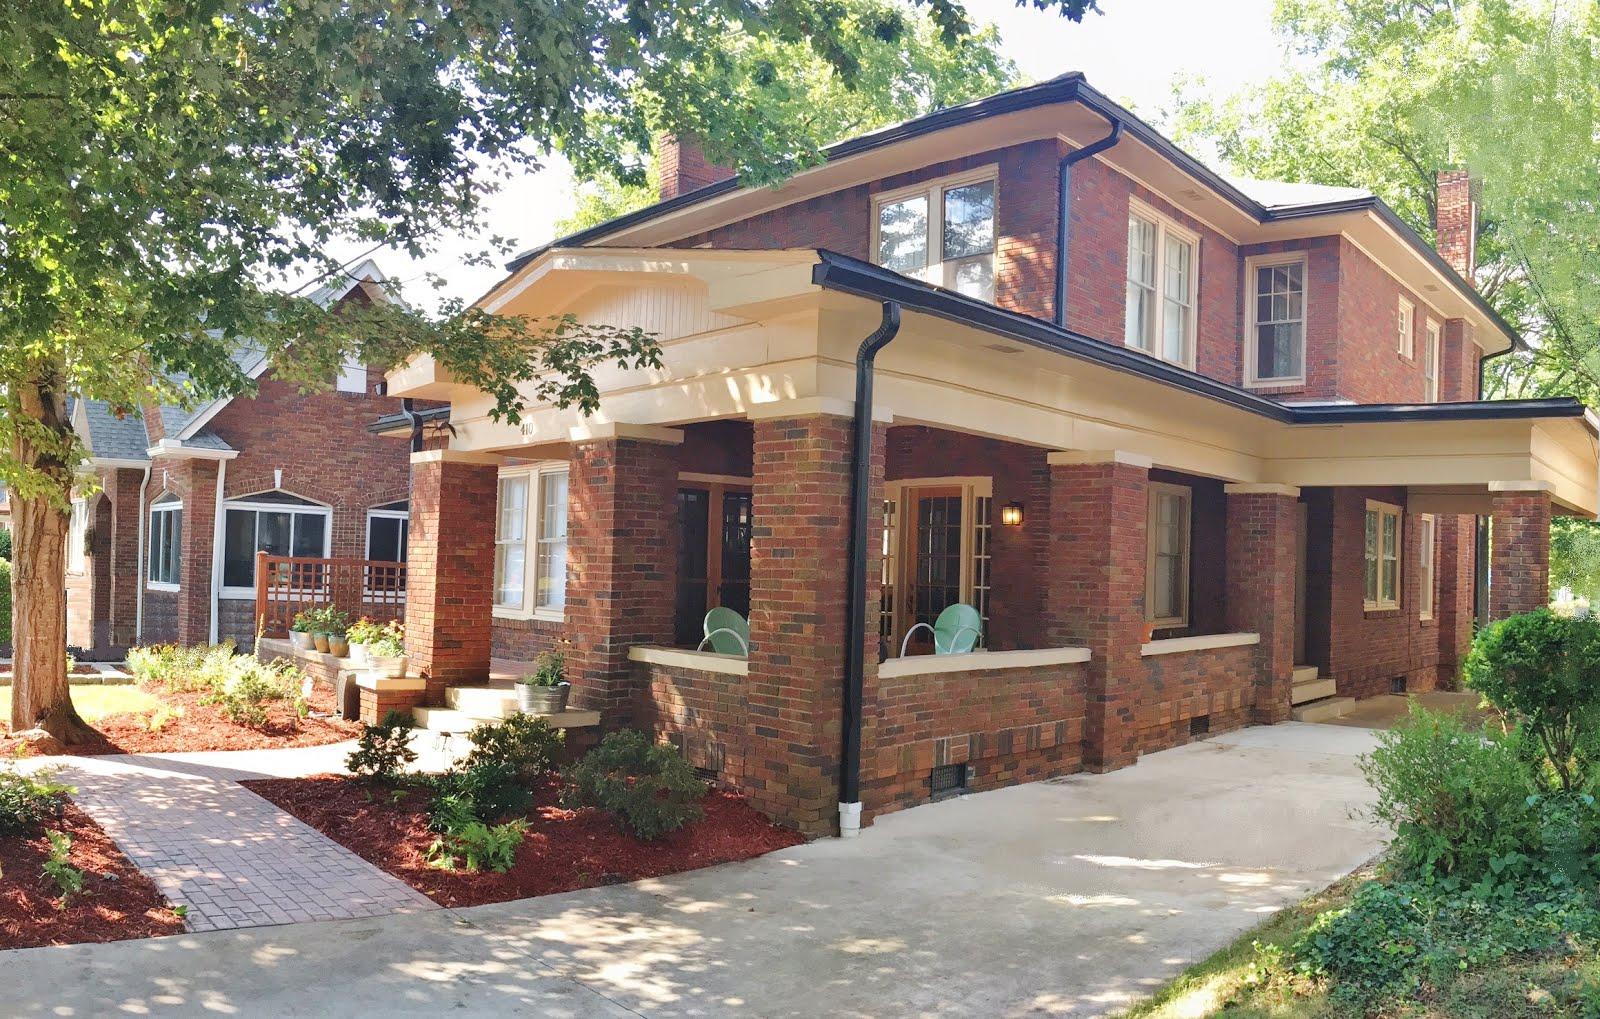 410 Mitchell Avenue, Salisbury NC 28144 ~ circa 1927 ~ $249,900